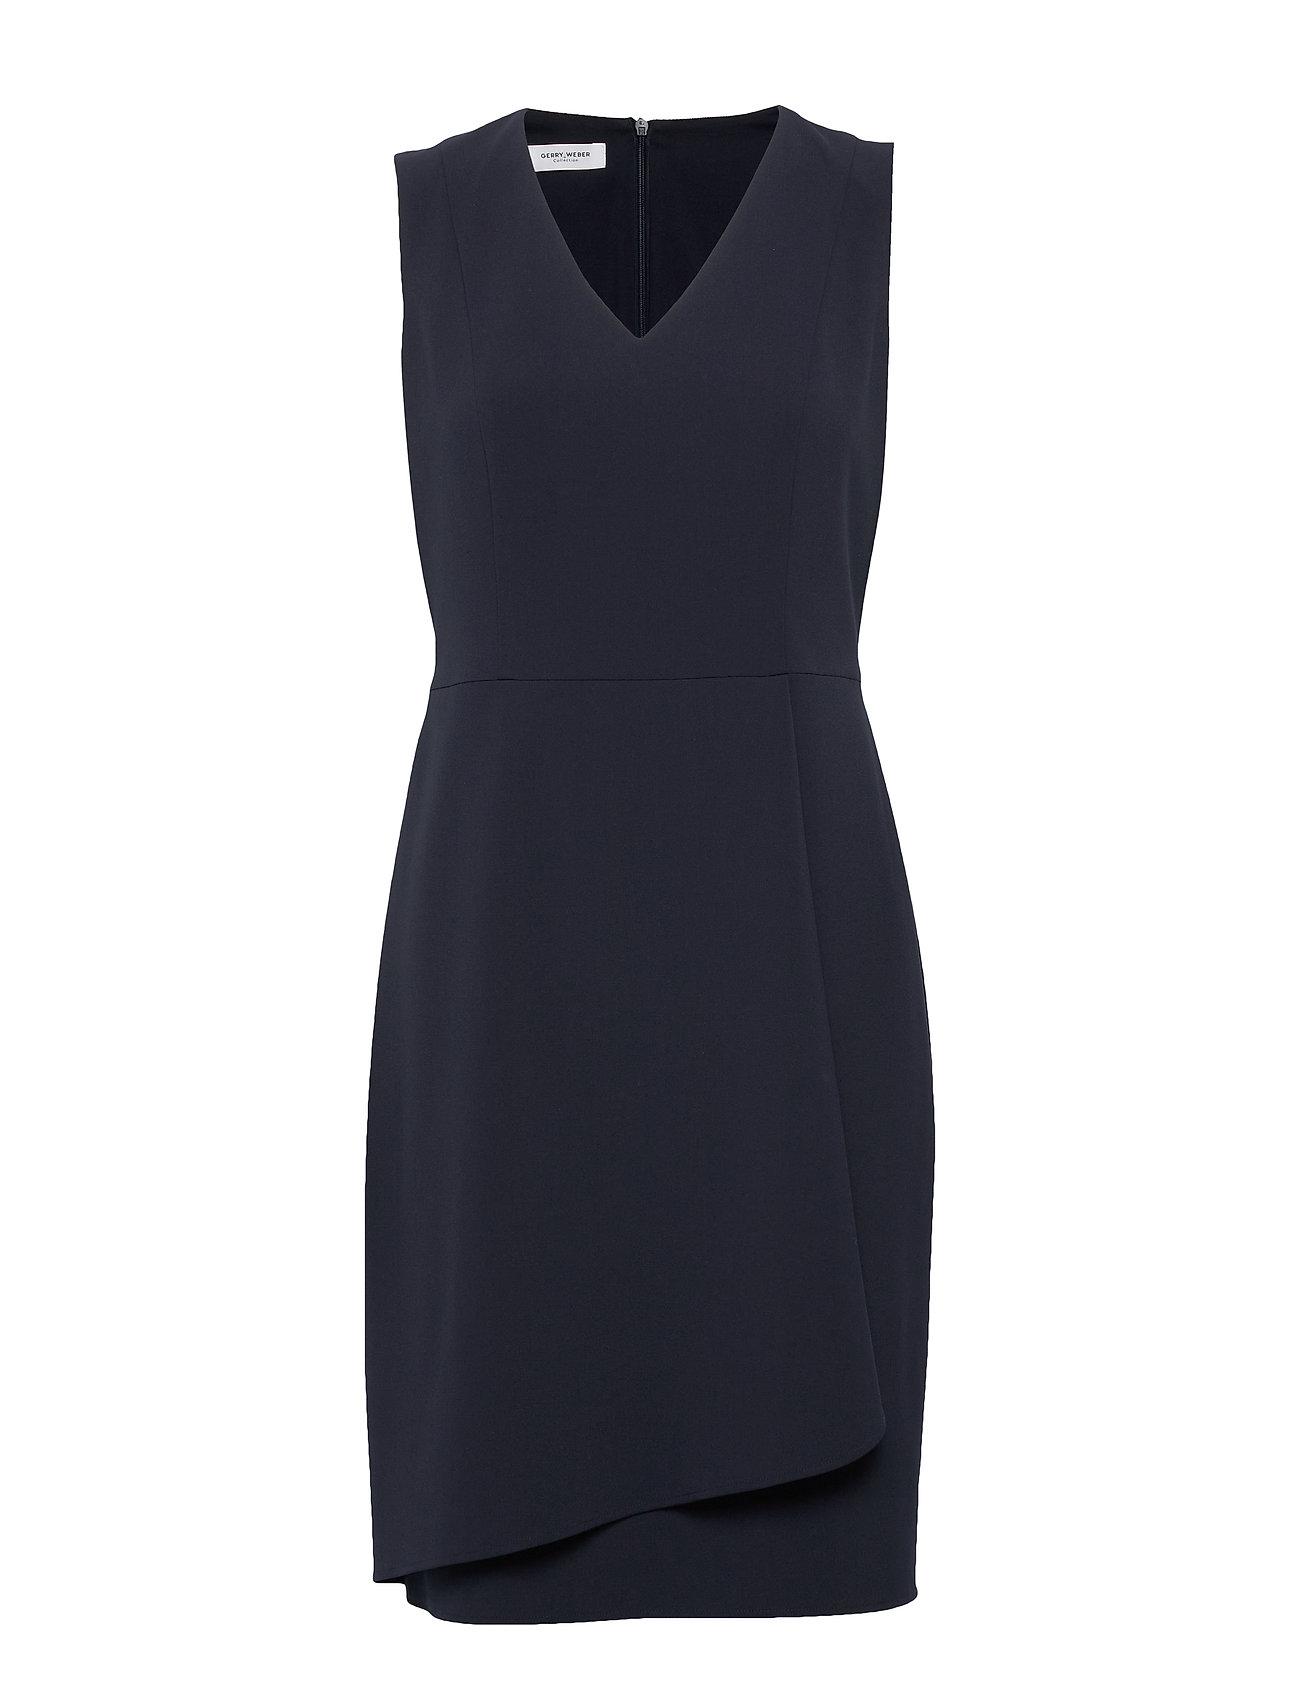 dress woven fabric kleid knielang blau gerry weber | foccz